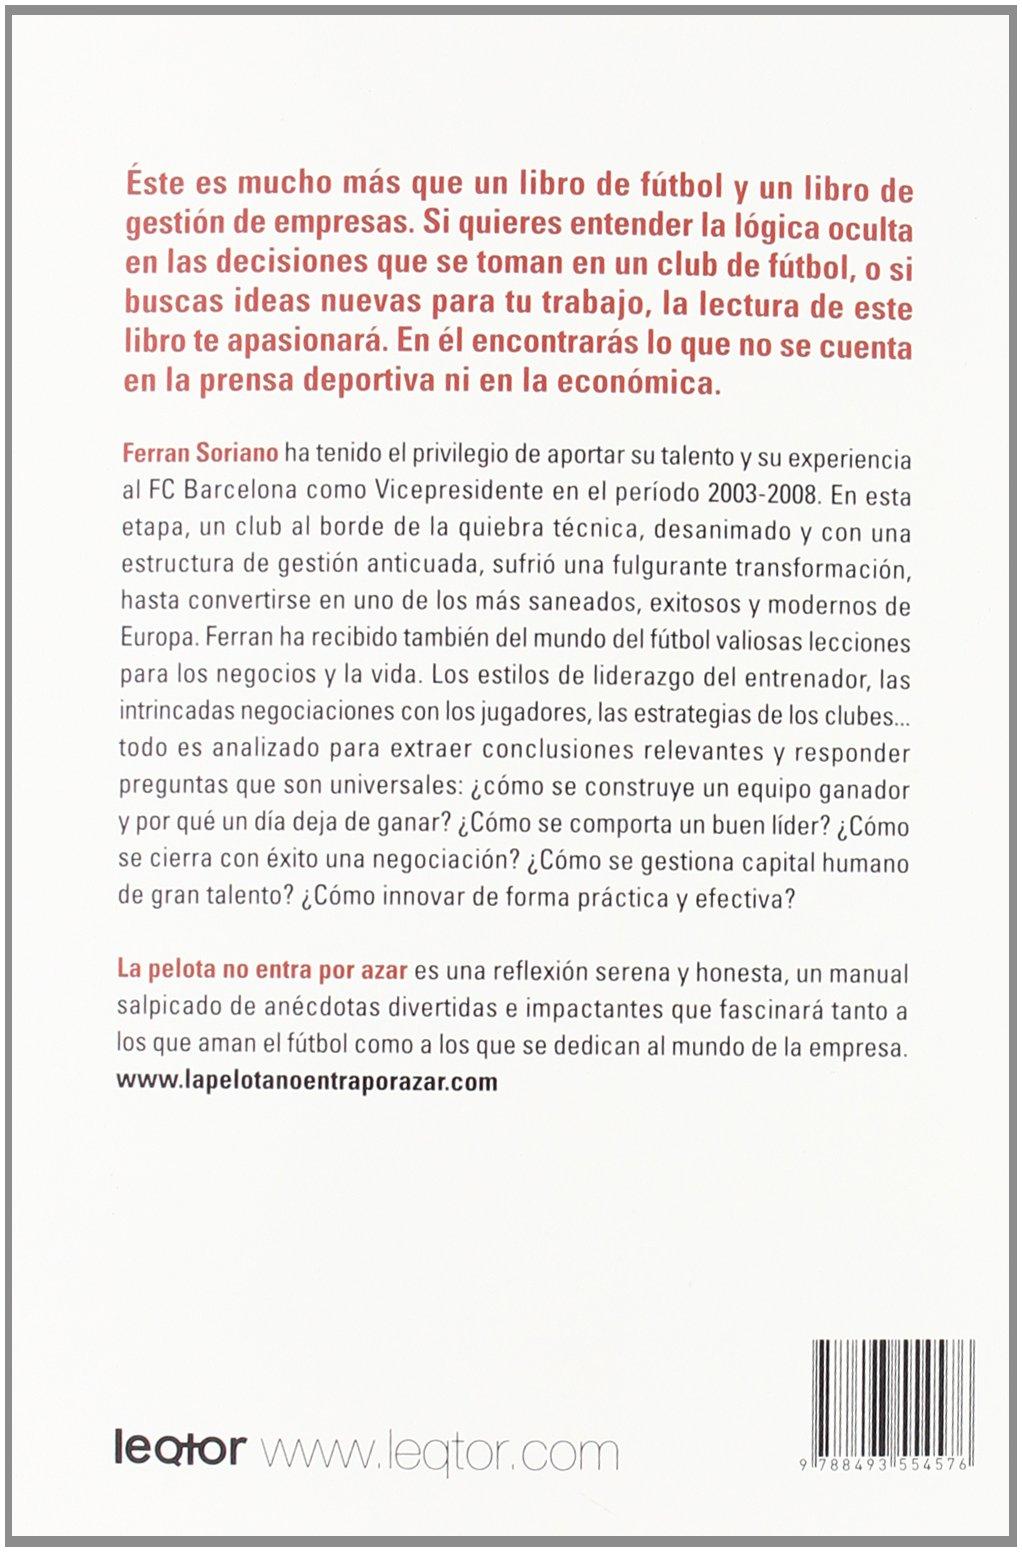 Pelota no entra por azar, La (Spanish Edition)